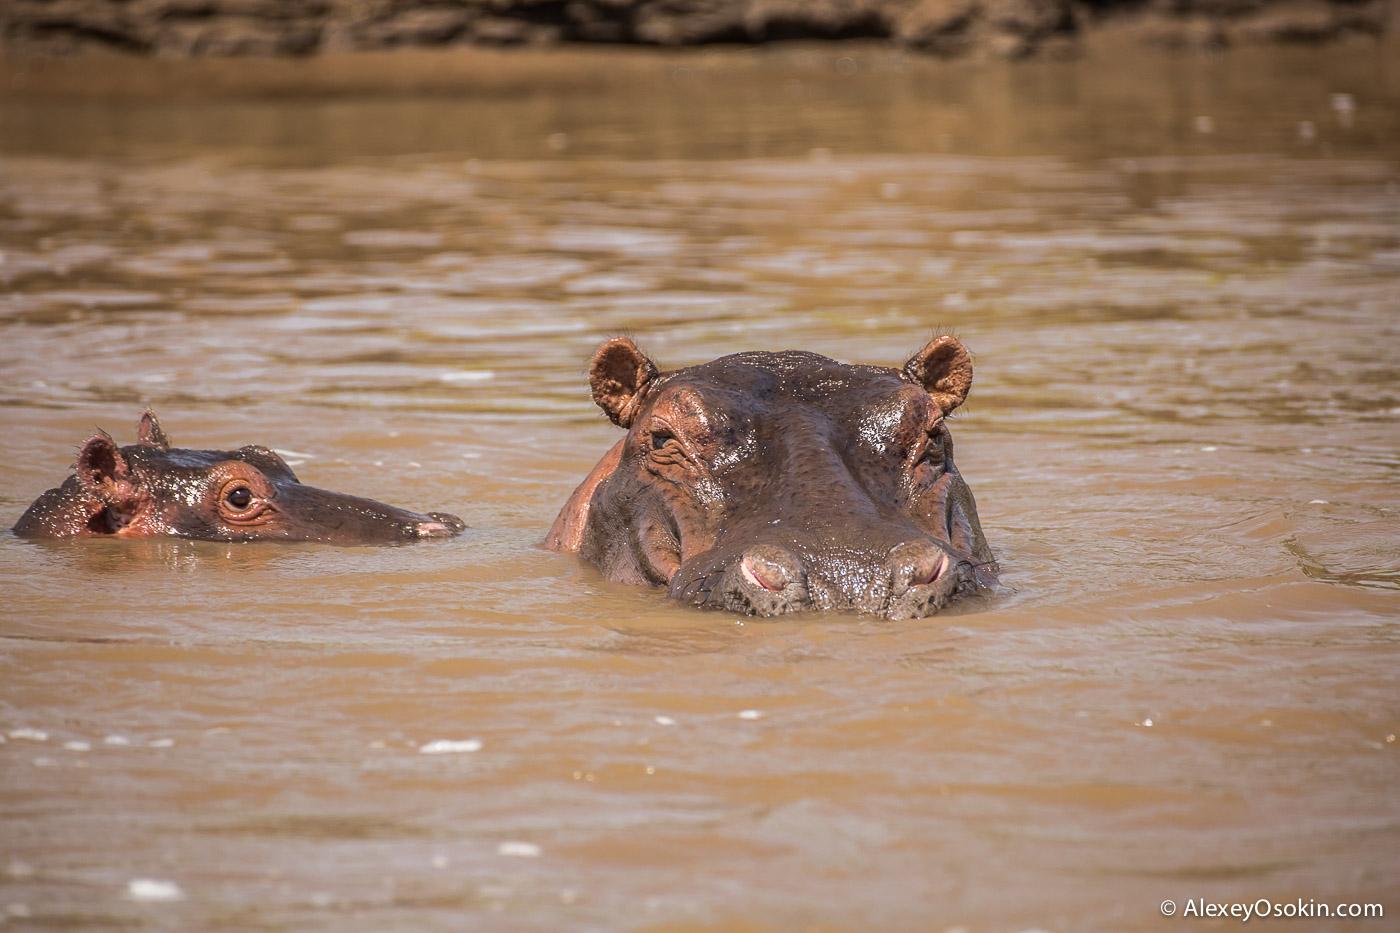 kenya - hippos-ao, aug.2015-2.jpg